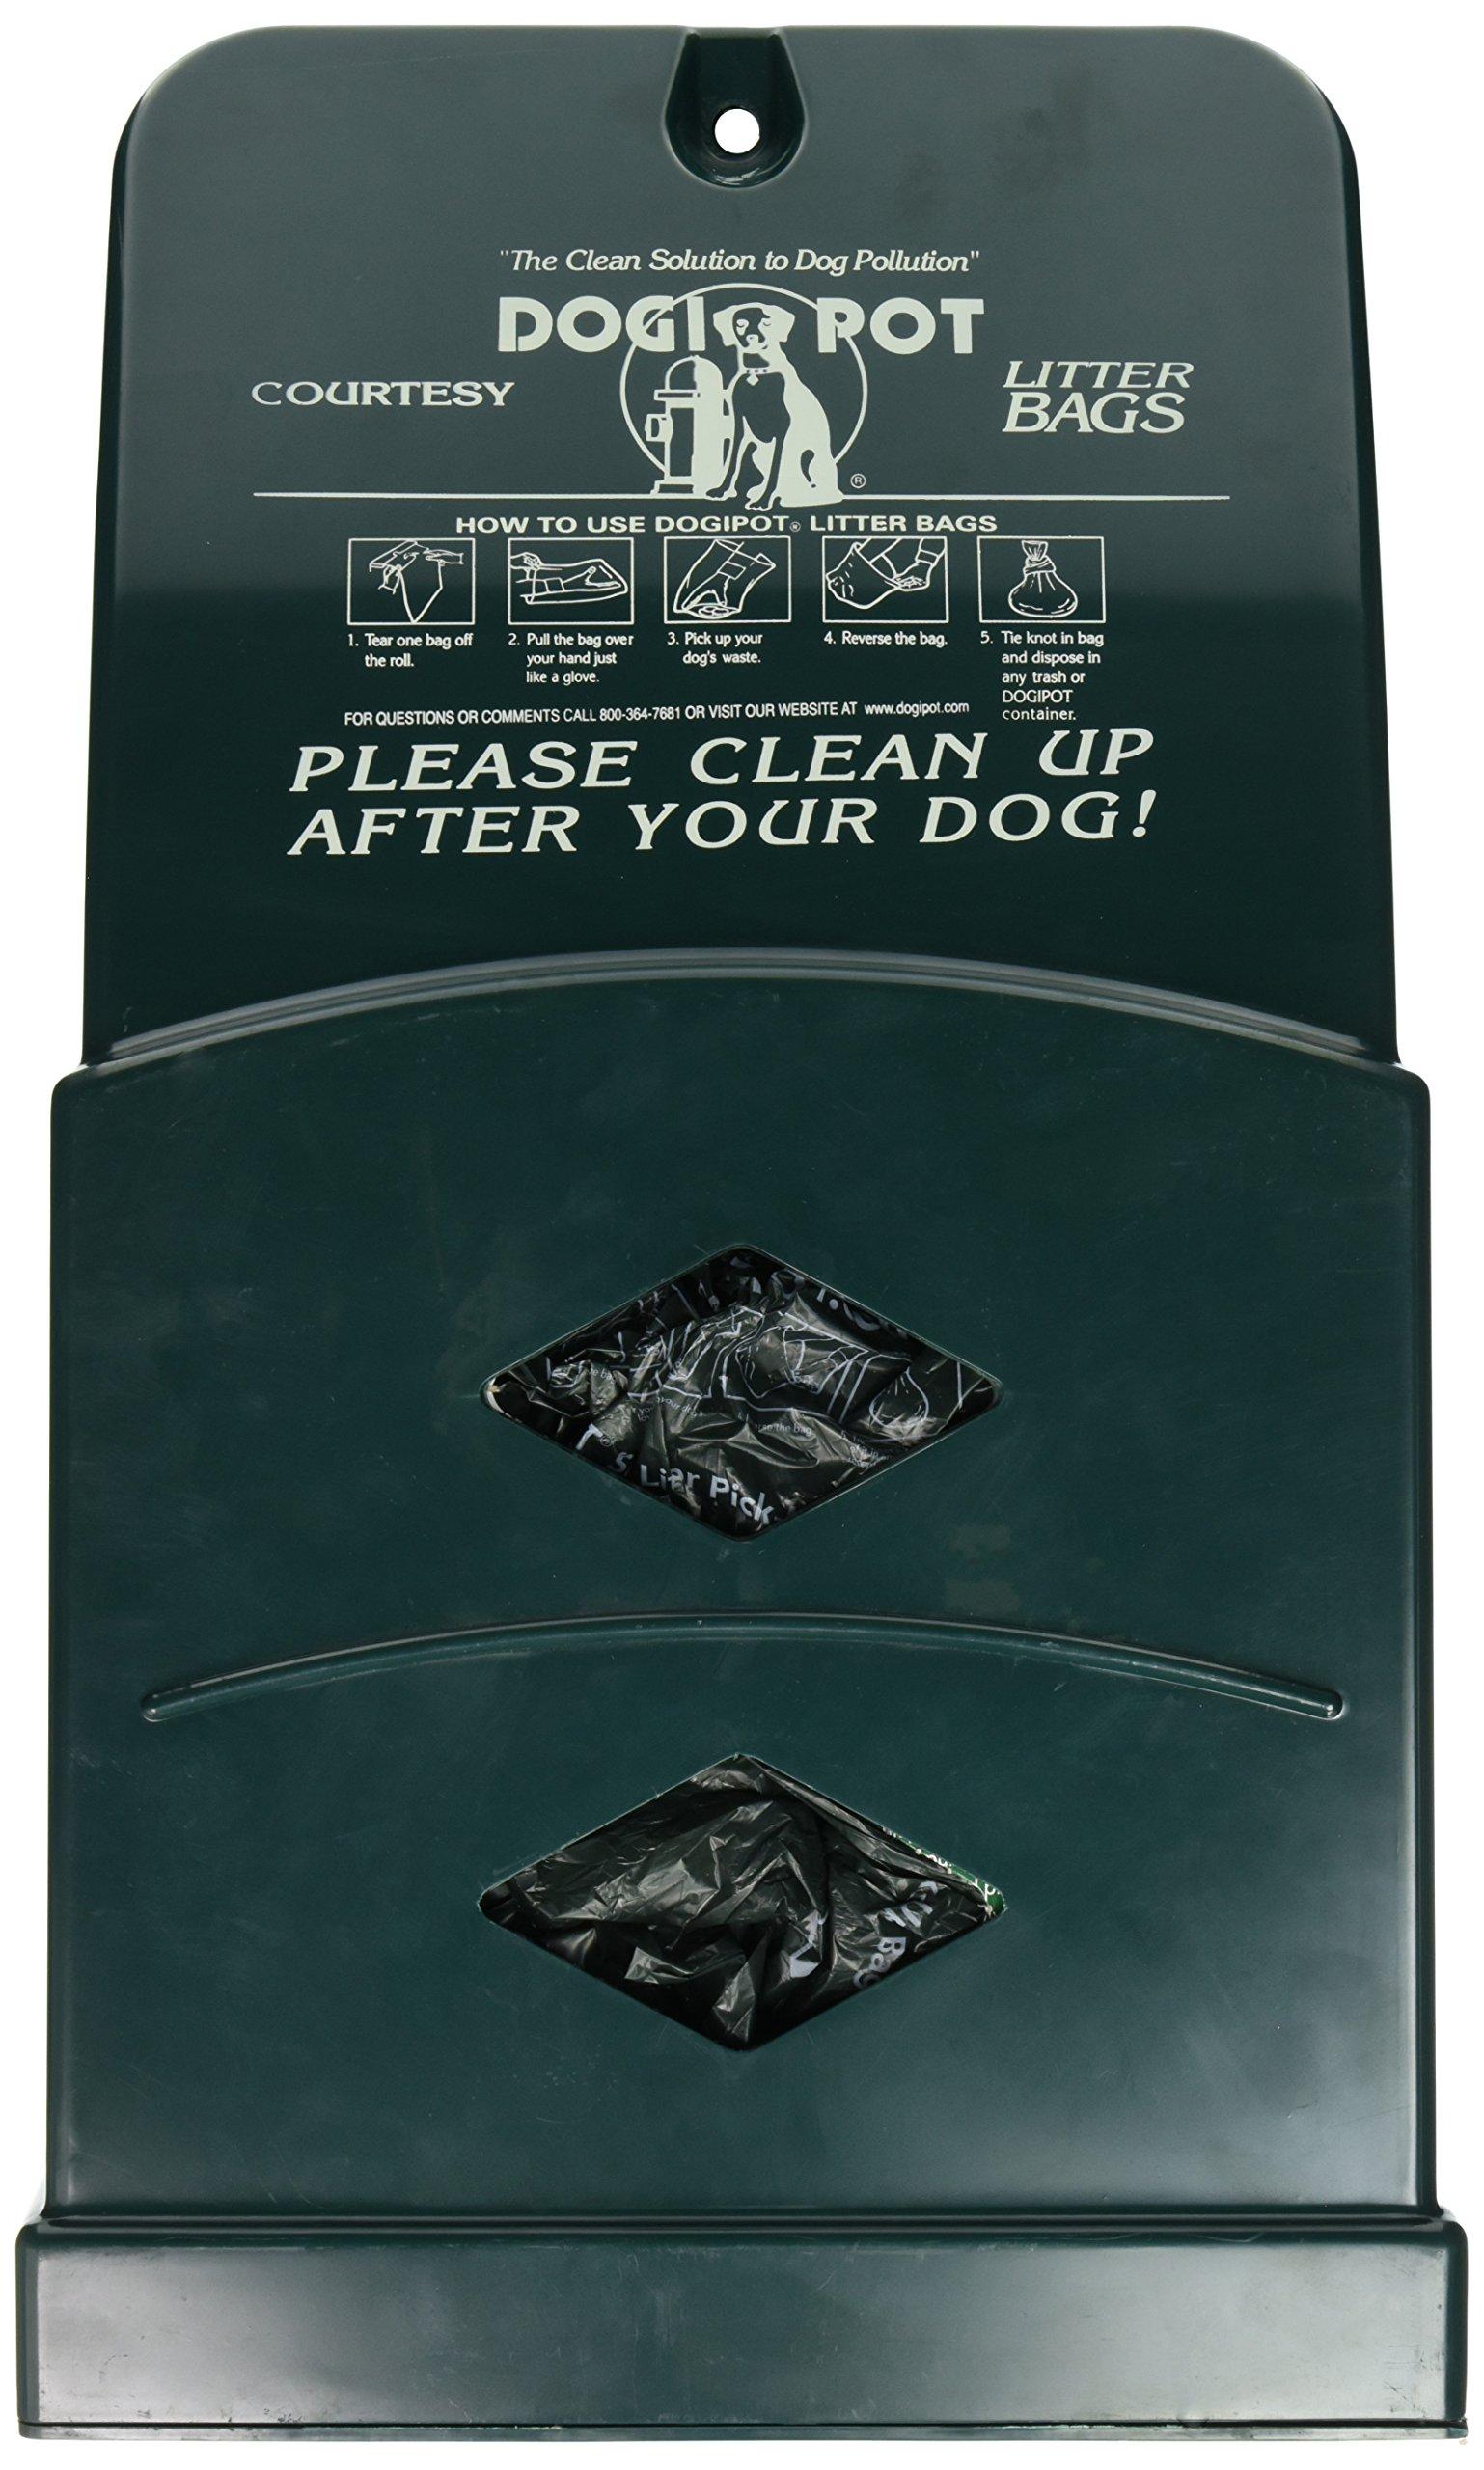 DOGIPOT 1007-2 Junior Bag Dispenser with Litter Bag Rolls, Polyethylene, Forest Green by Dogipot